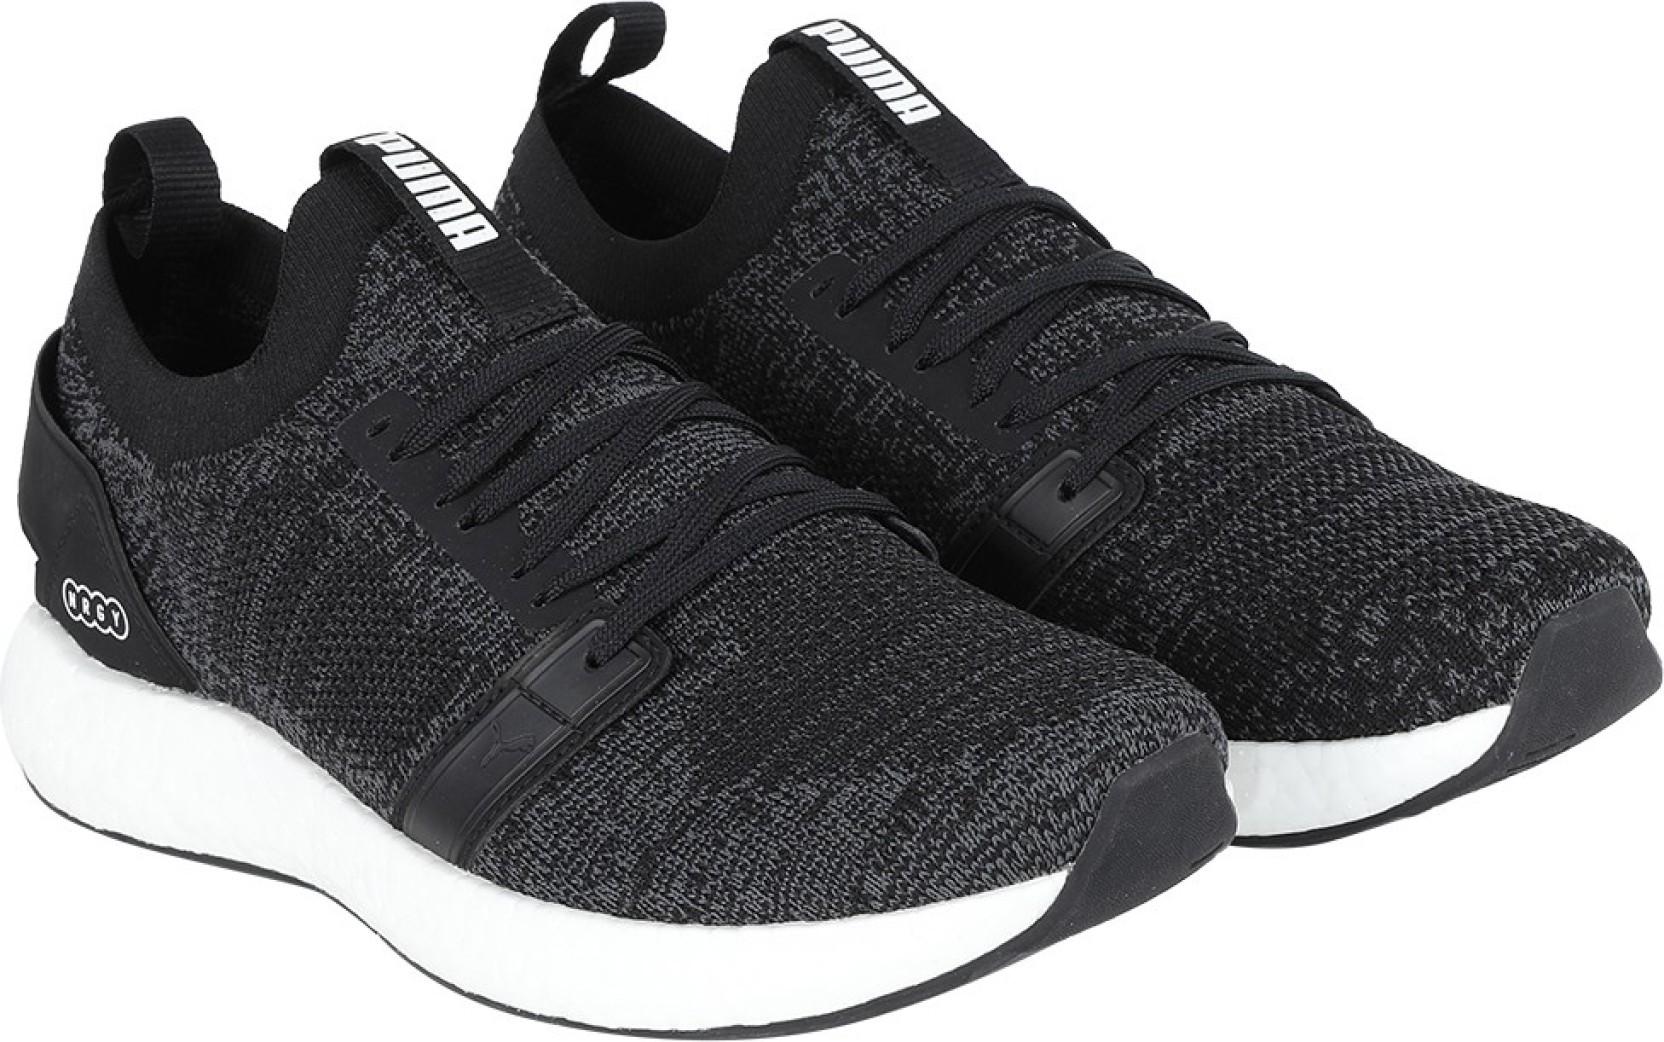 Puma NRGY Neko Engineer Knit Training   Gym Shoes For Men - Buy Puma ... 7152dd206